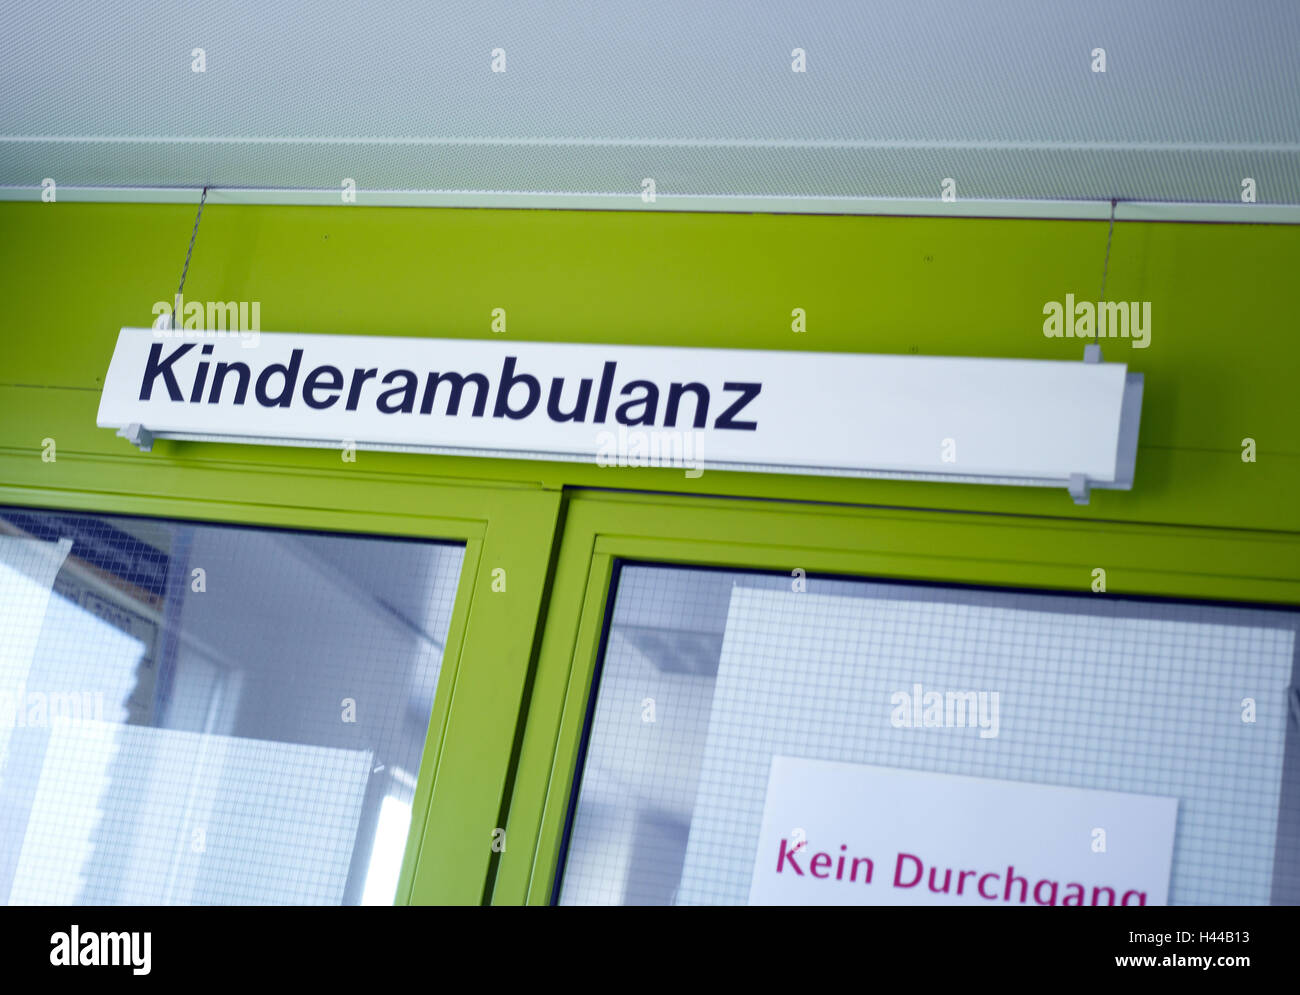 children's outpatients clinic, sign, patient's information, - Stock Image